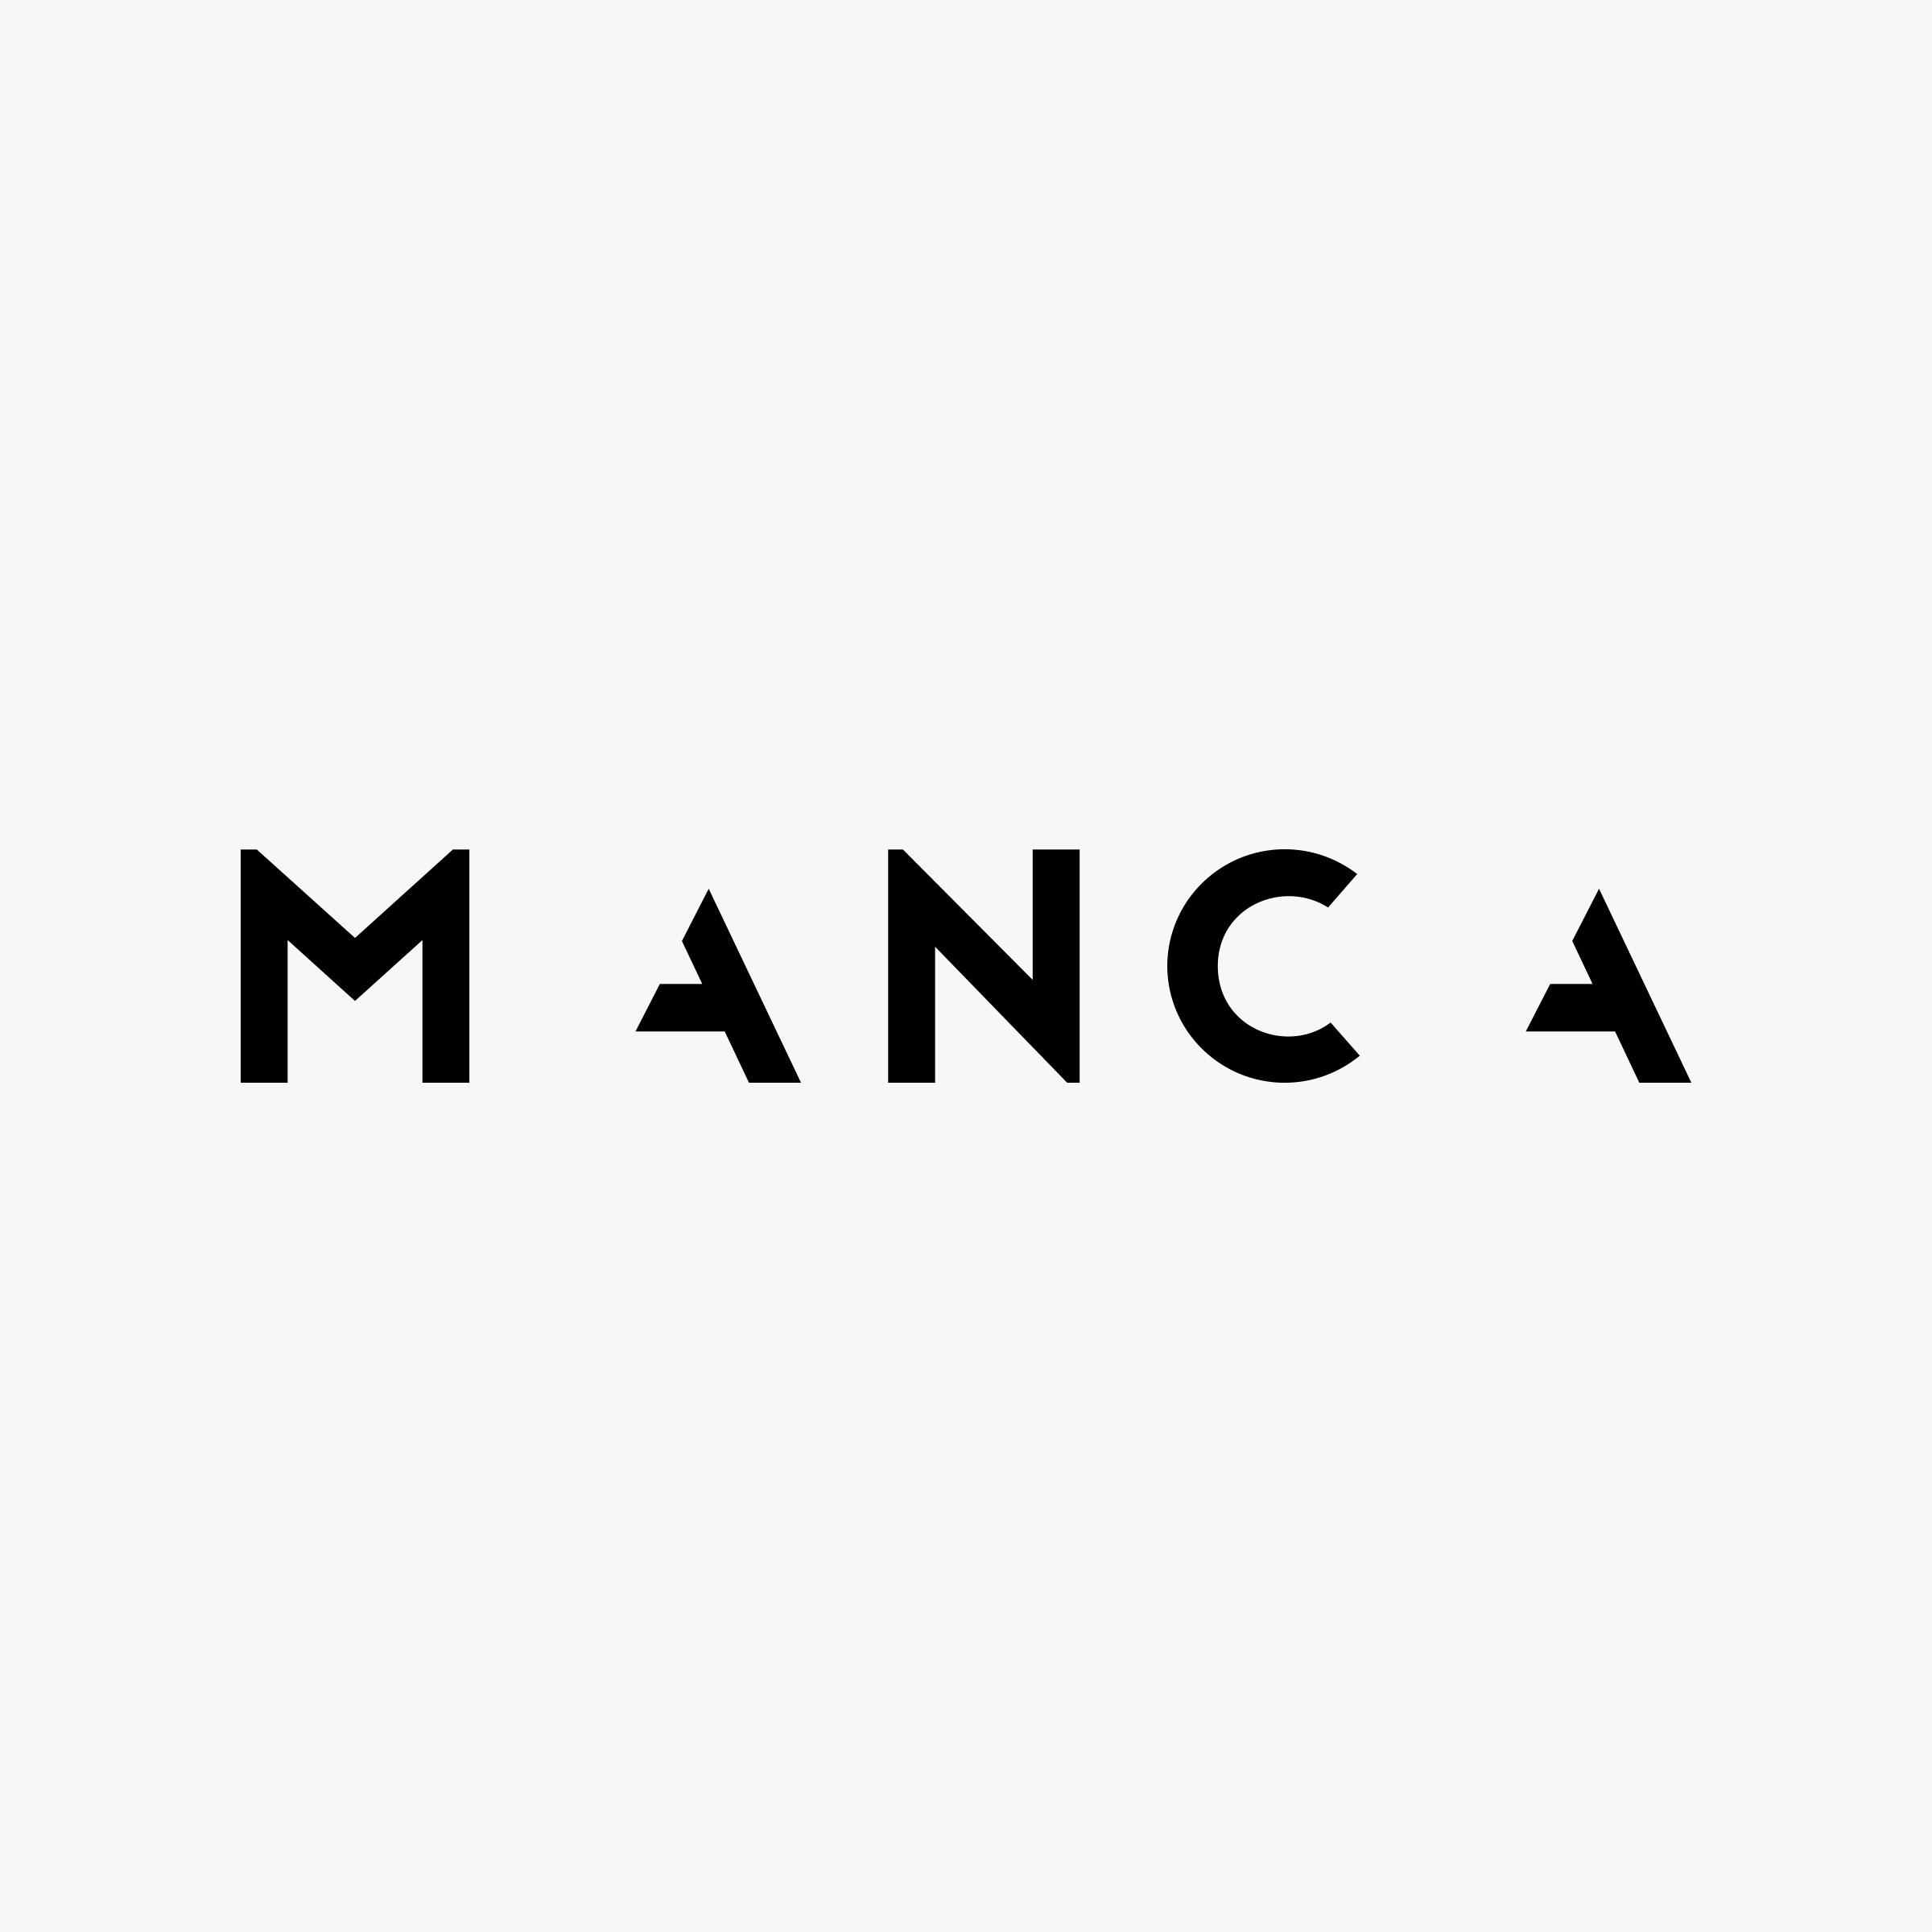 manca-logo-design-by-create.jpg